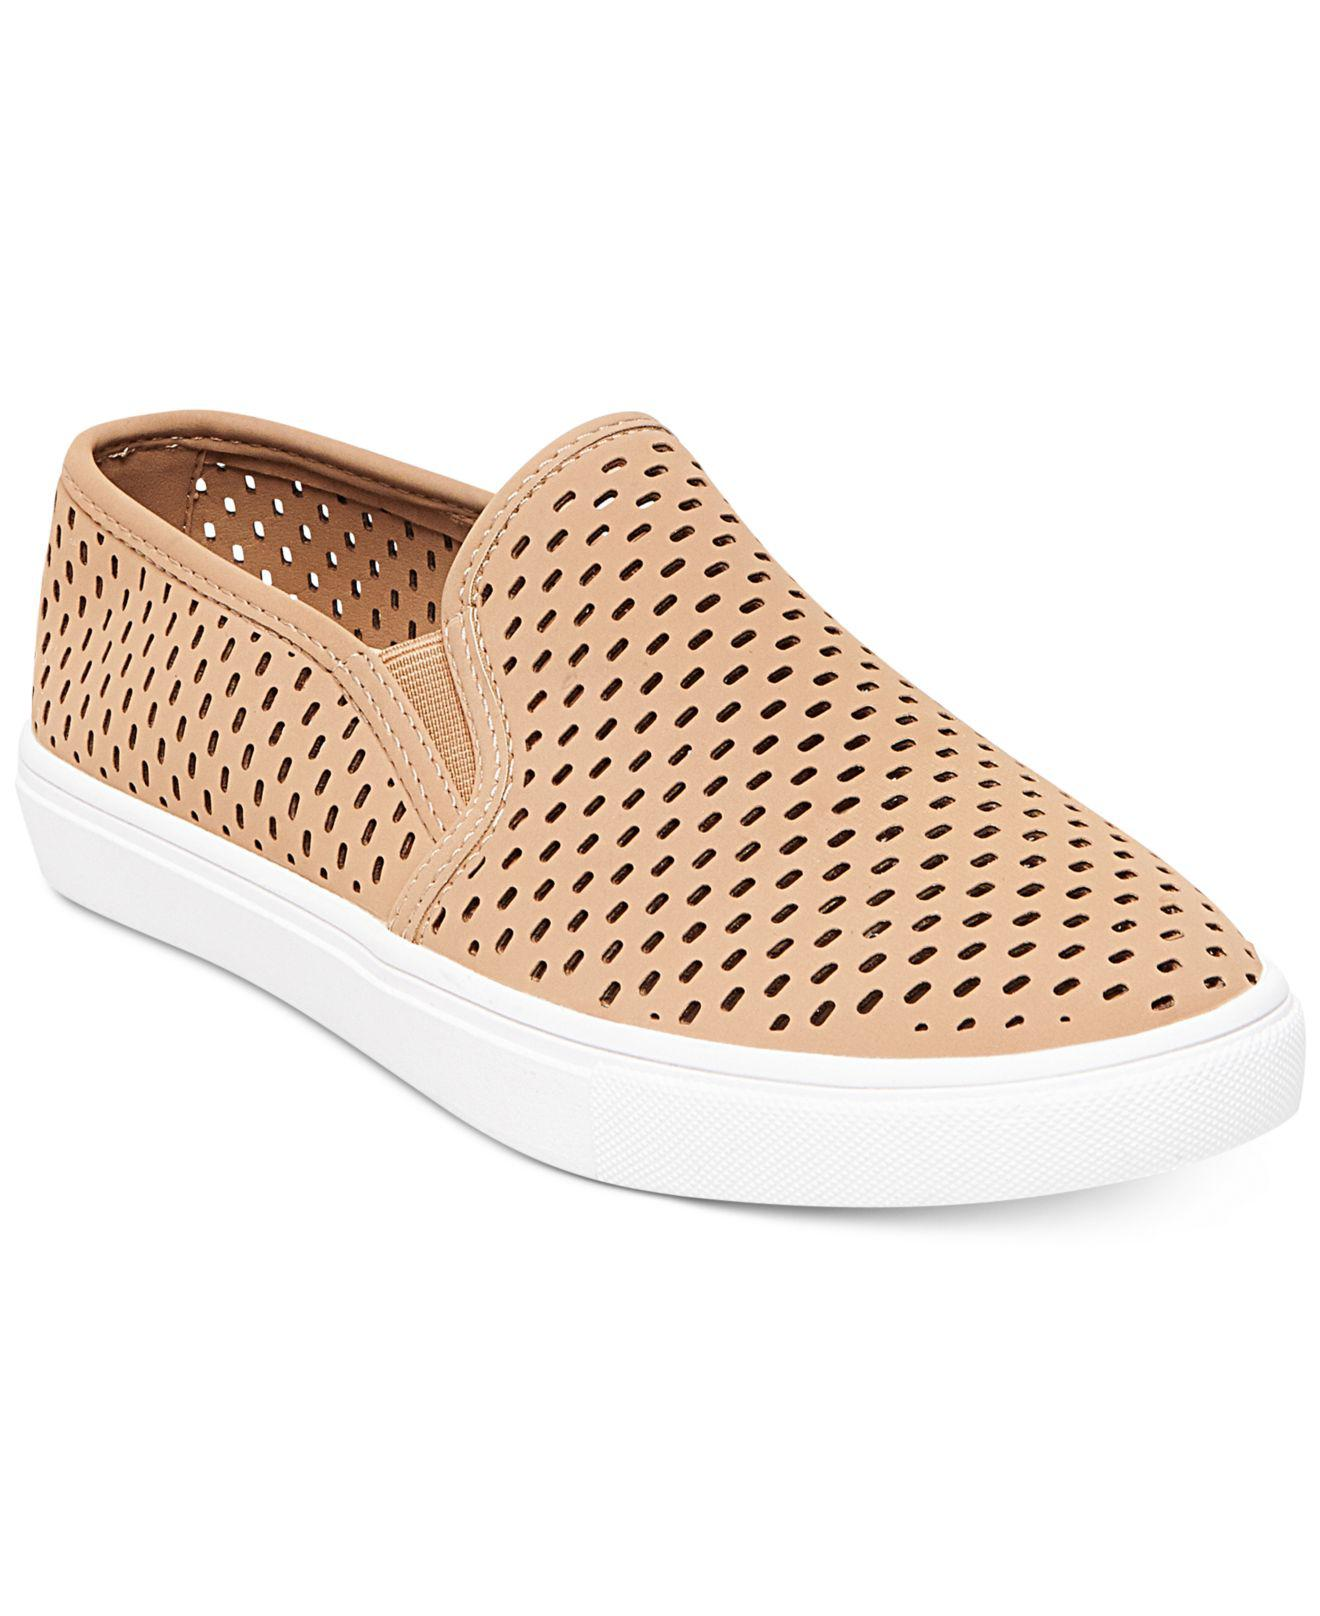 d77f1b95bfa Lyst - Steve Madden Women s Elouise Perforated Slide-on Sneakers